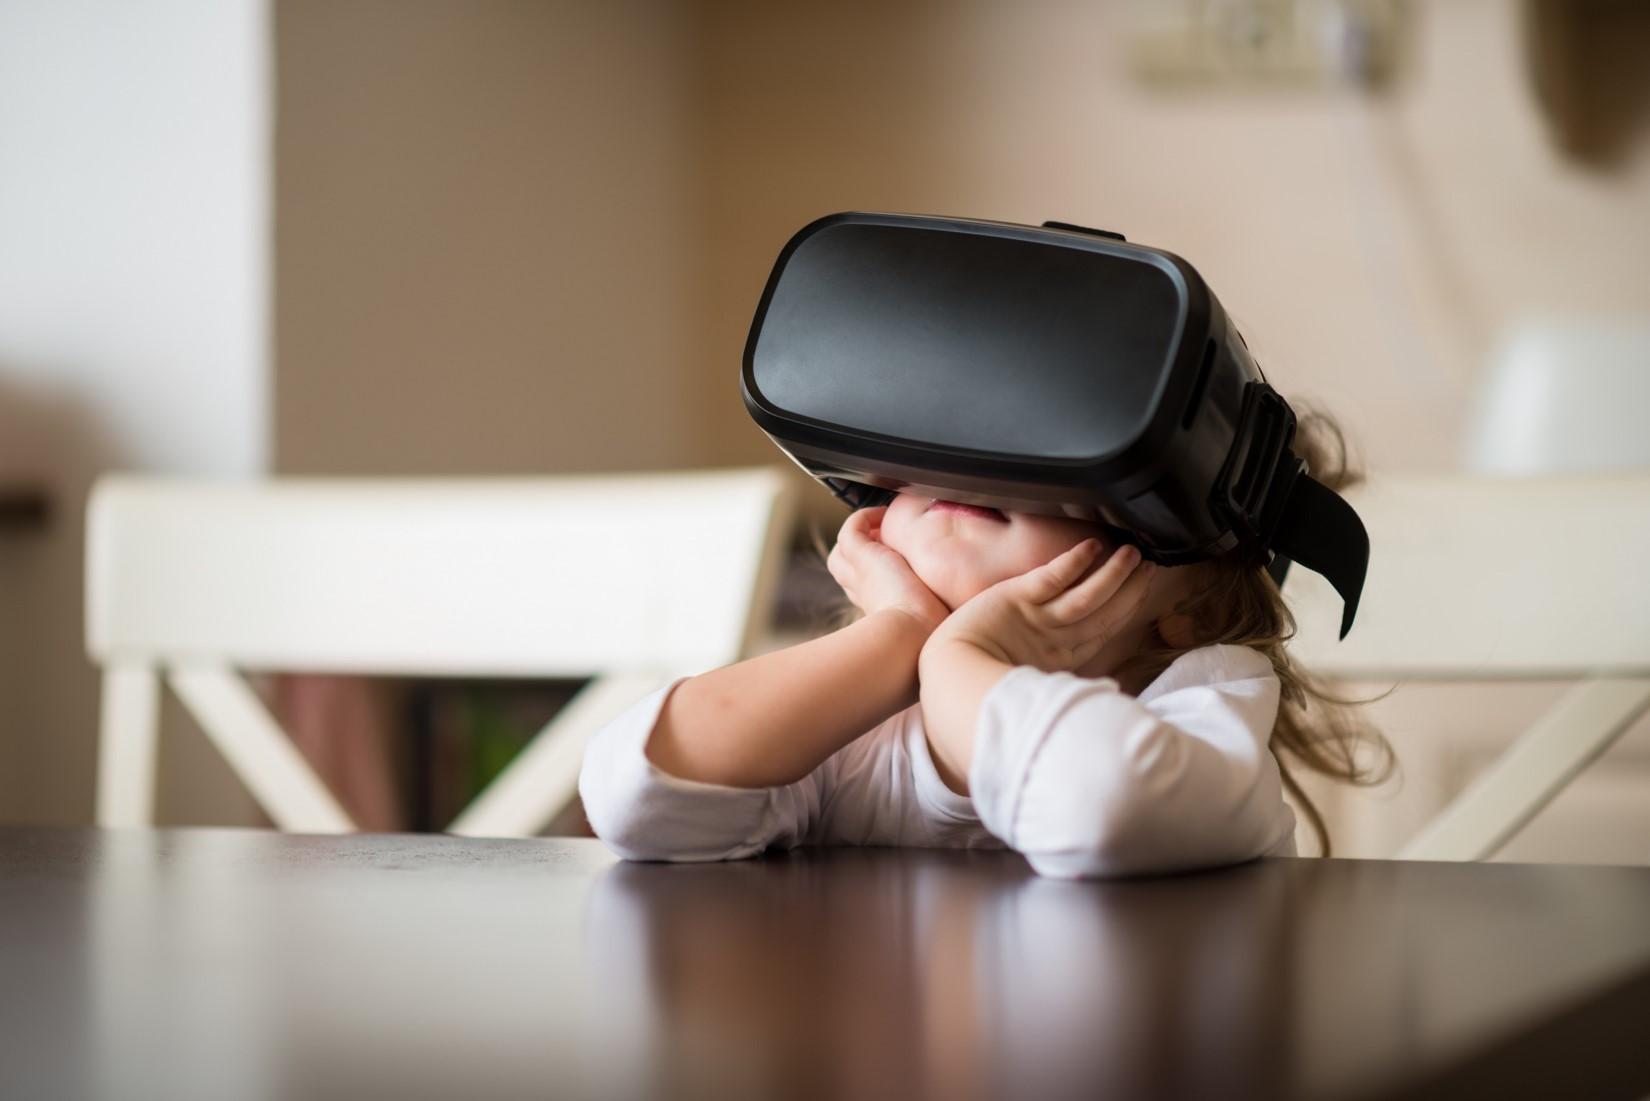 Realidad Virtual Y Marketing 14 | Virtual Reality And Marketing 14